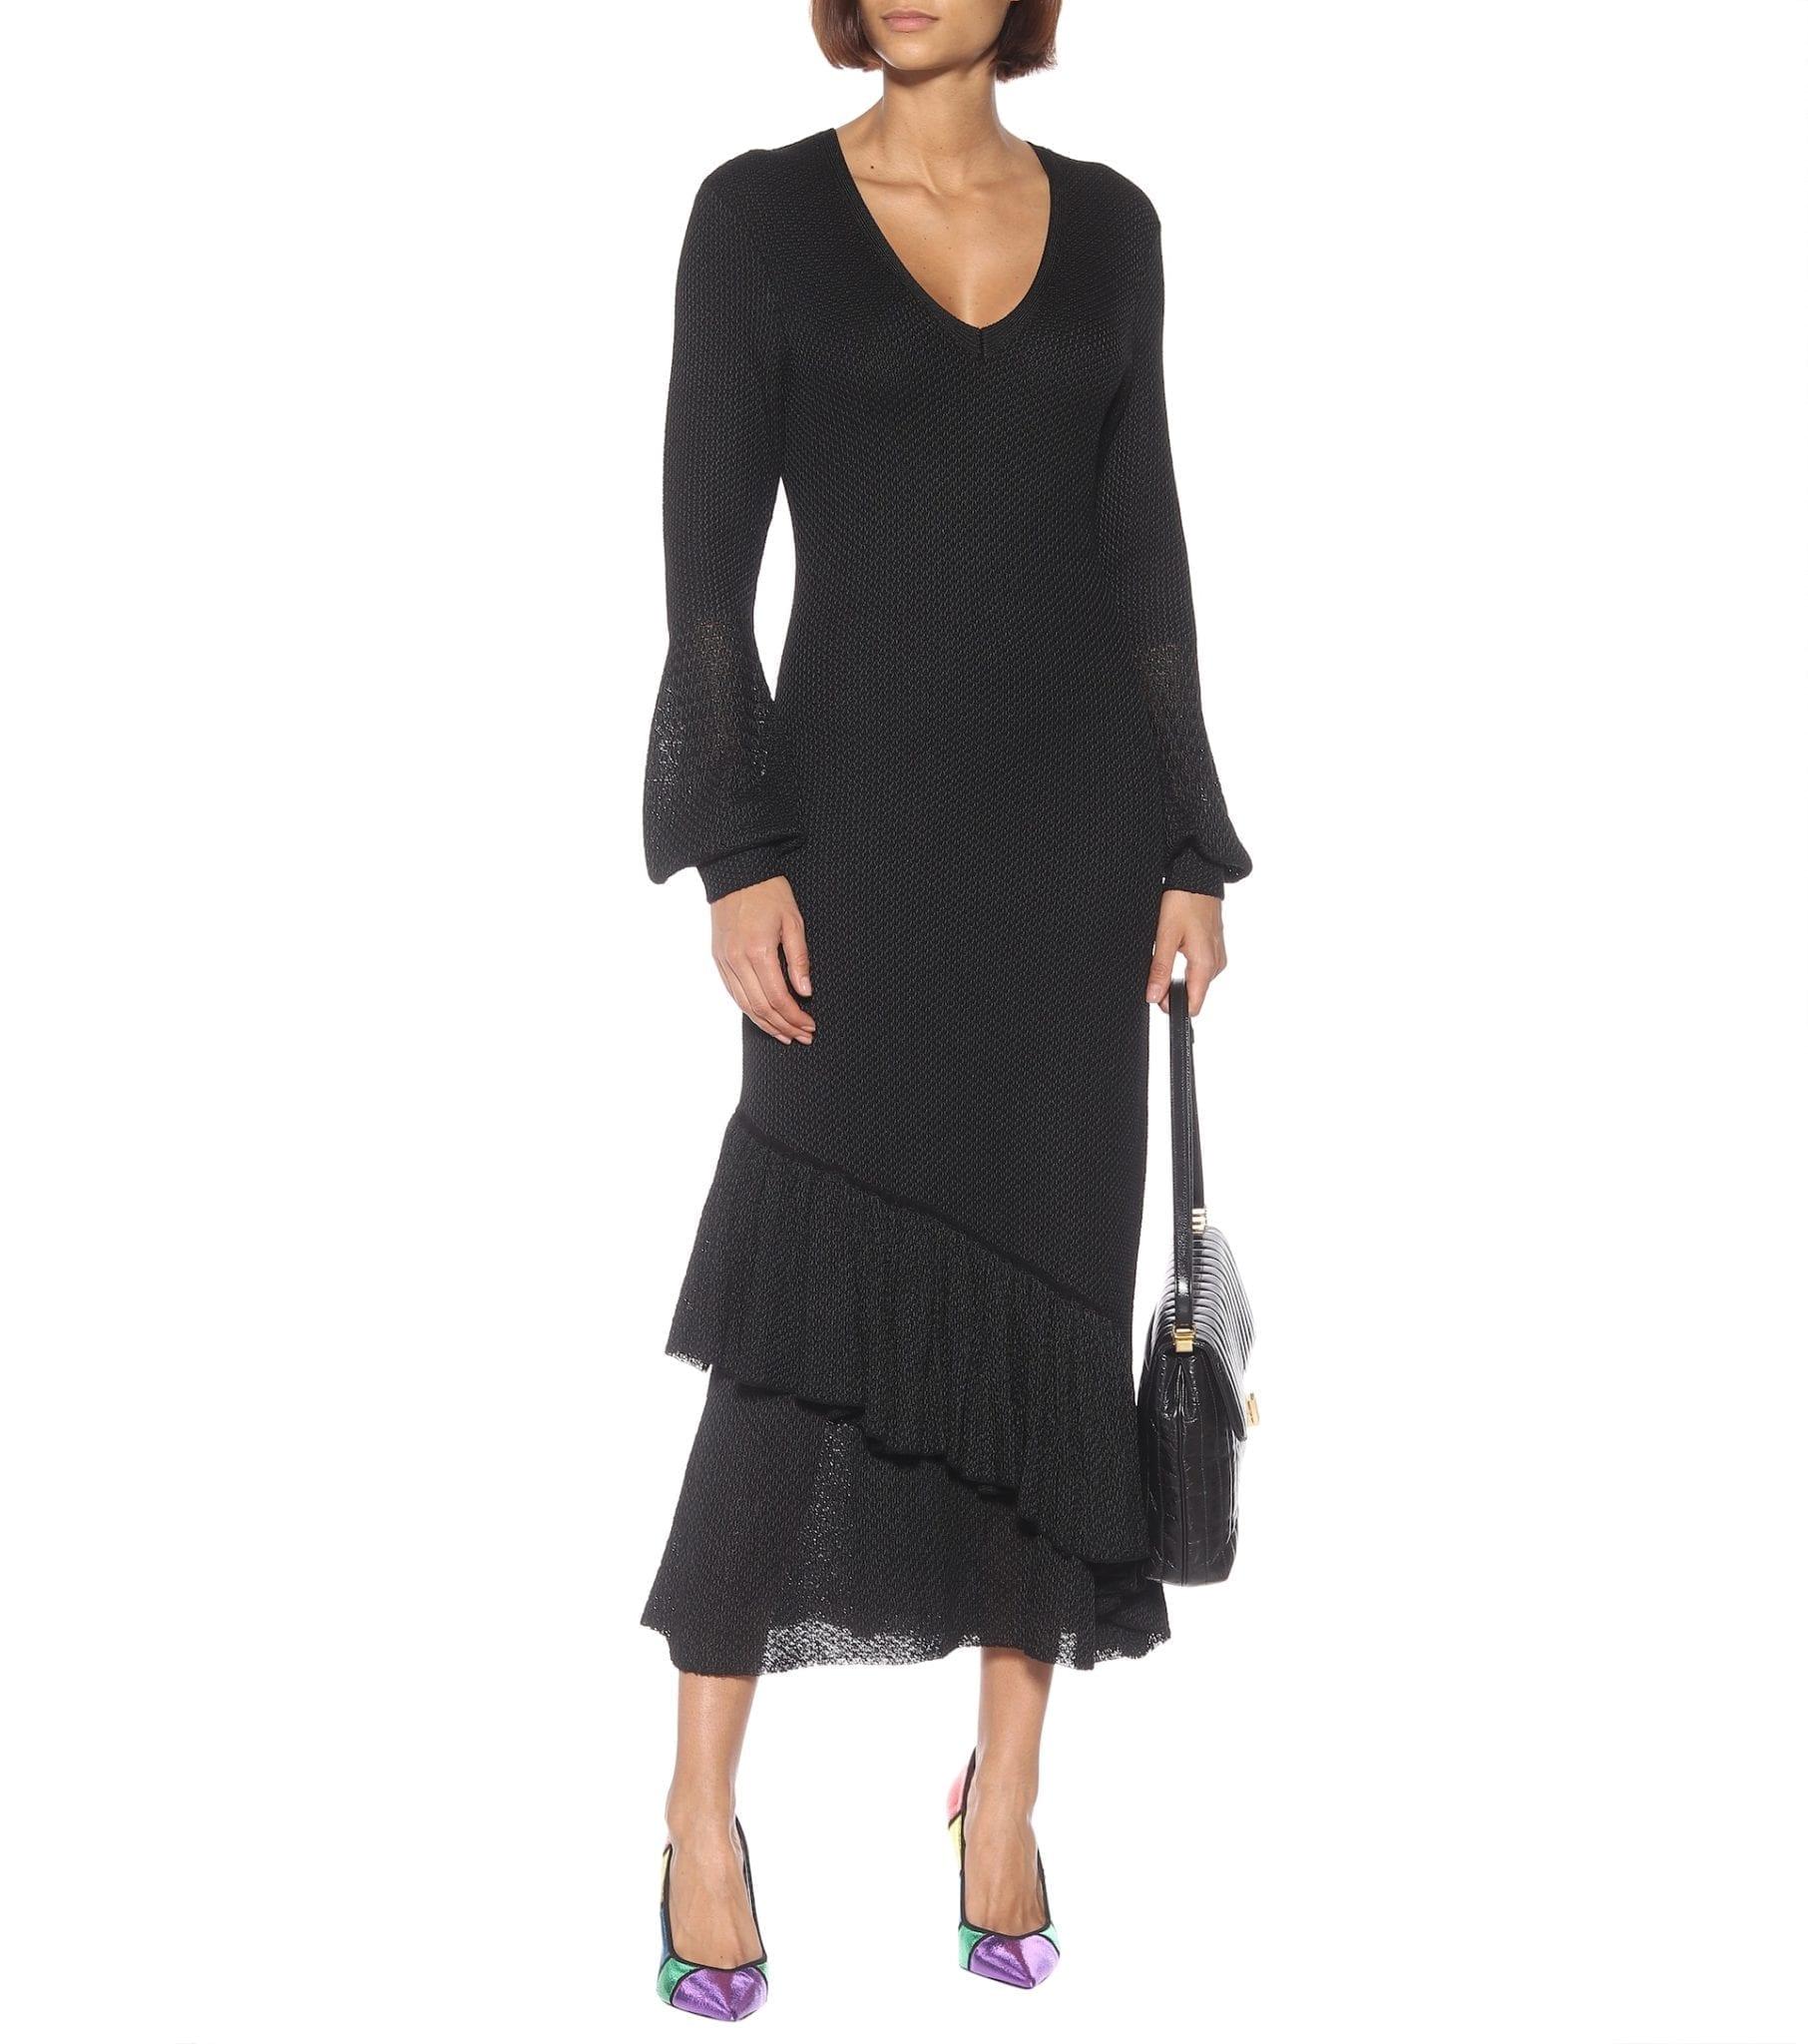 VICTORIA BECKHAM Knit Ruffled Midi Dress